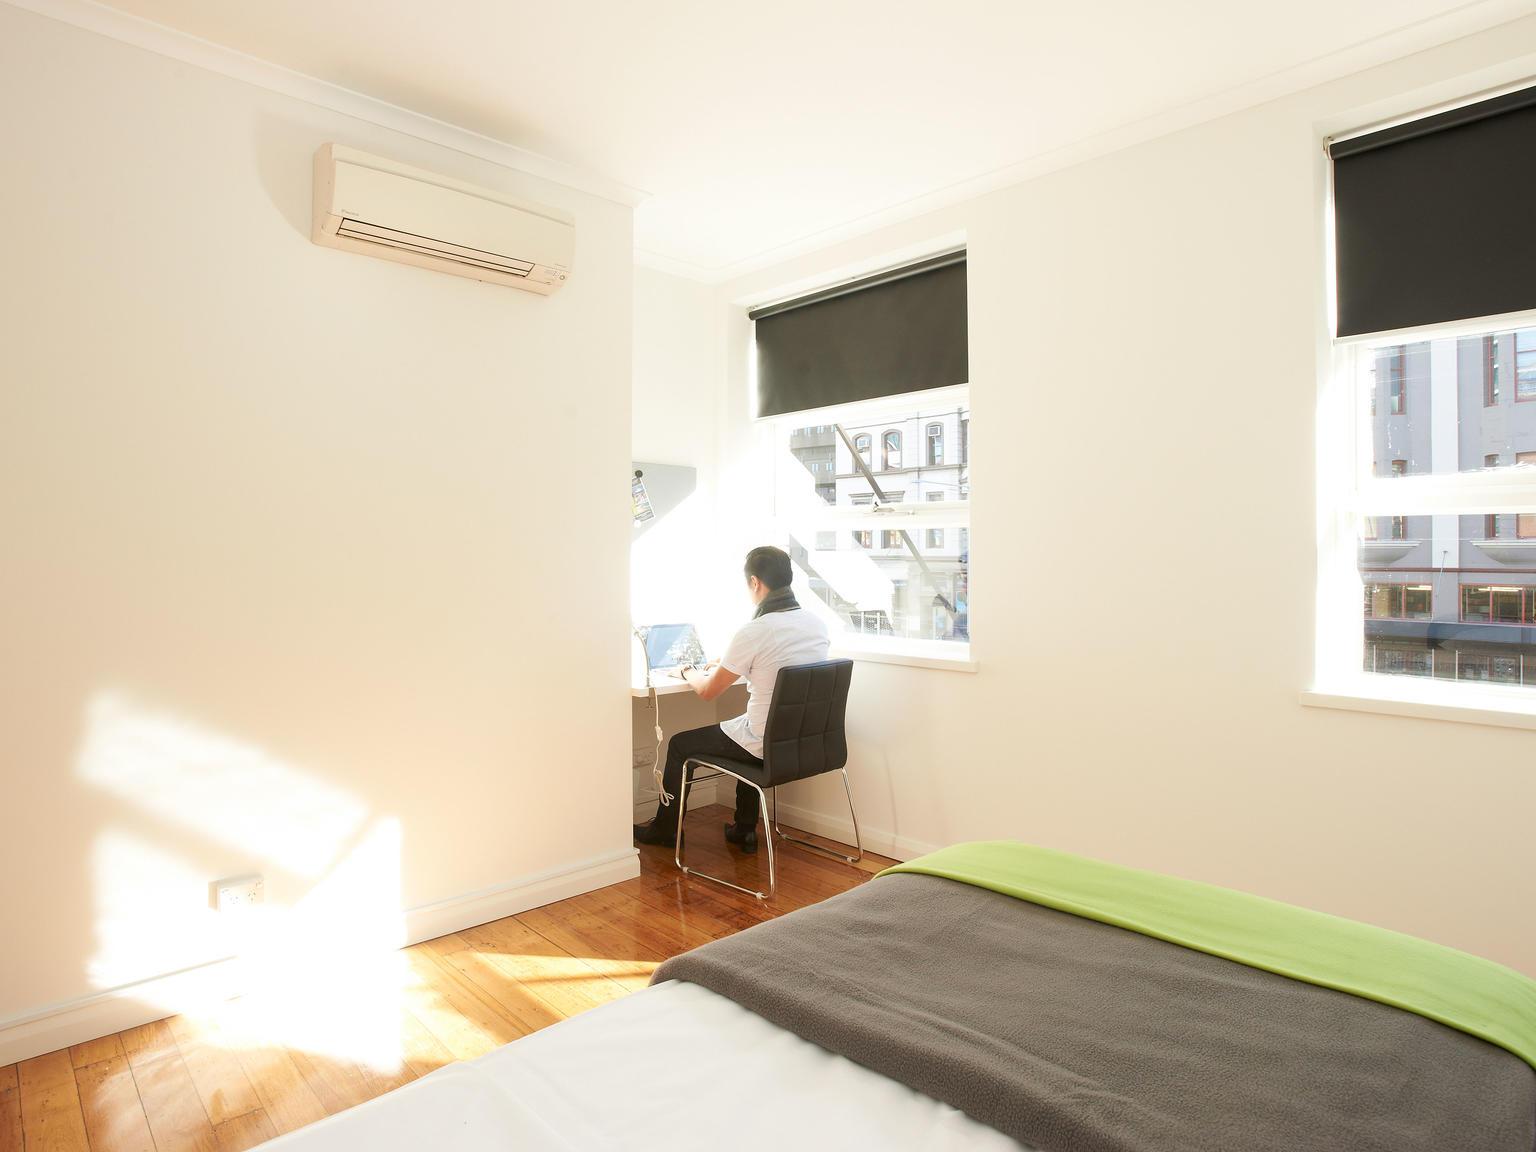 sydney_acc_link2_residence_bedroom_01-1